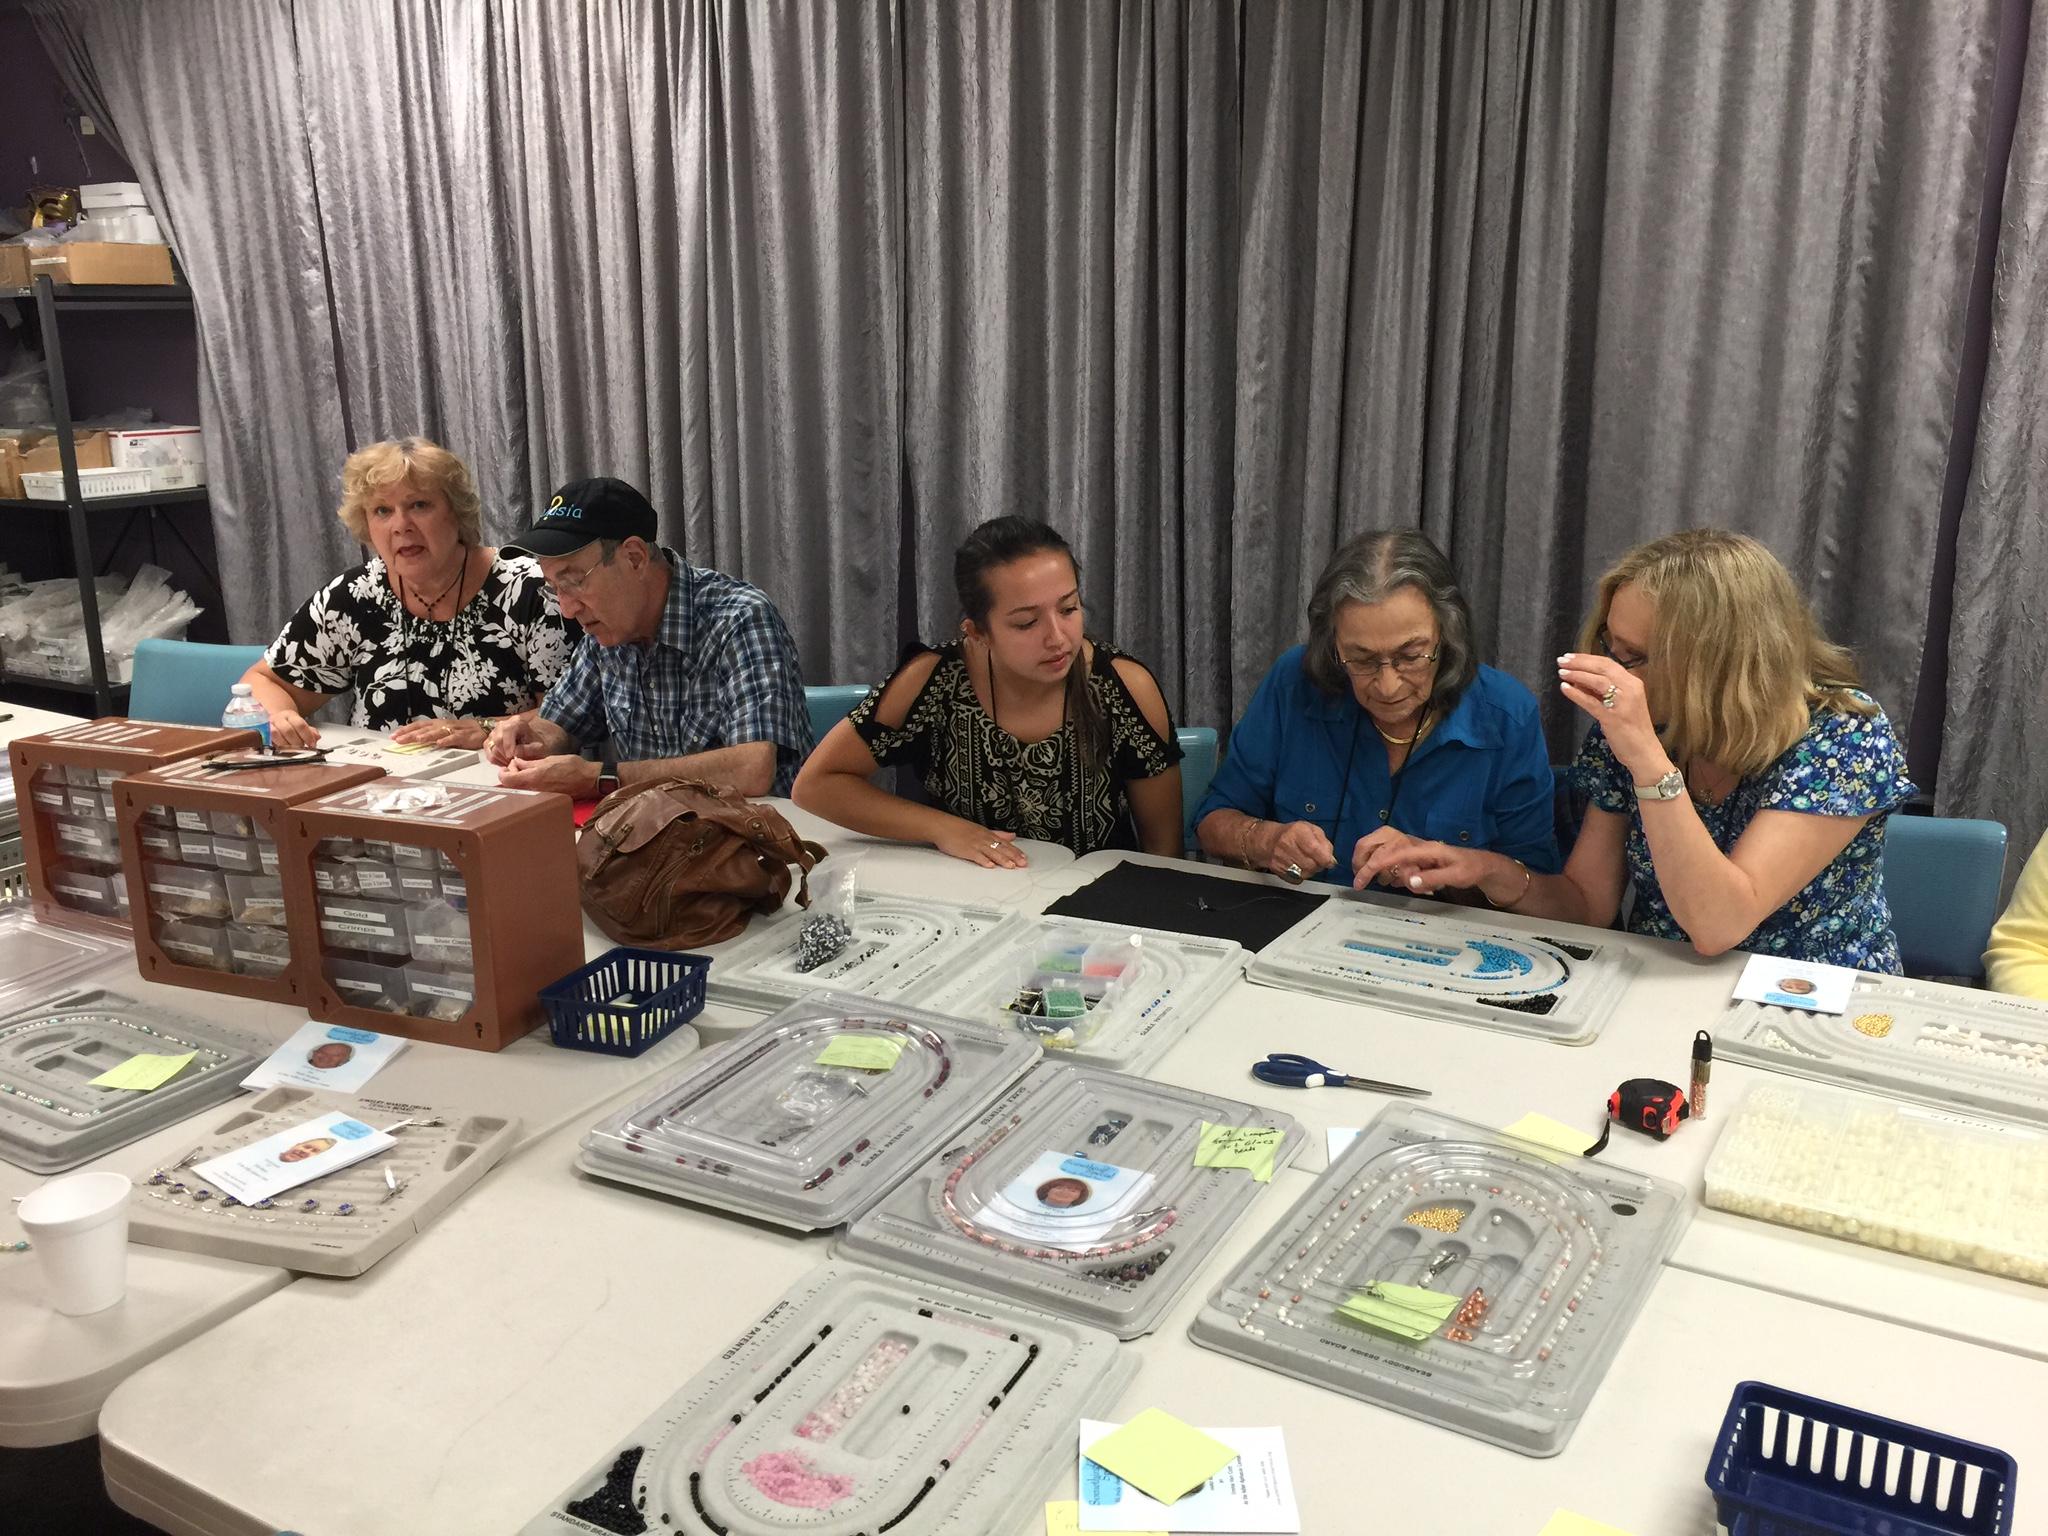 community service tour of the adler aphasia center ncjwbcs